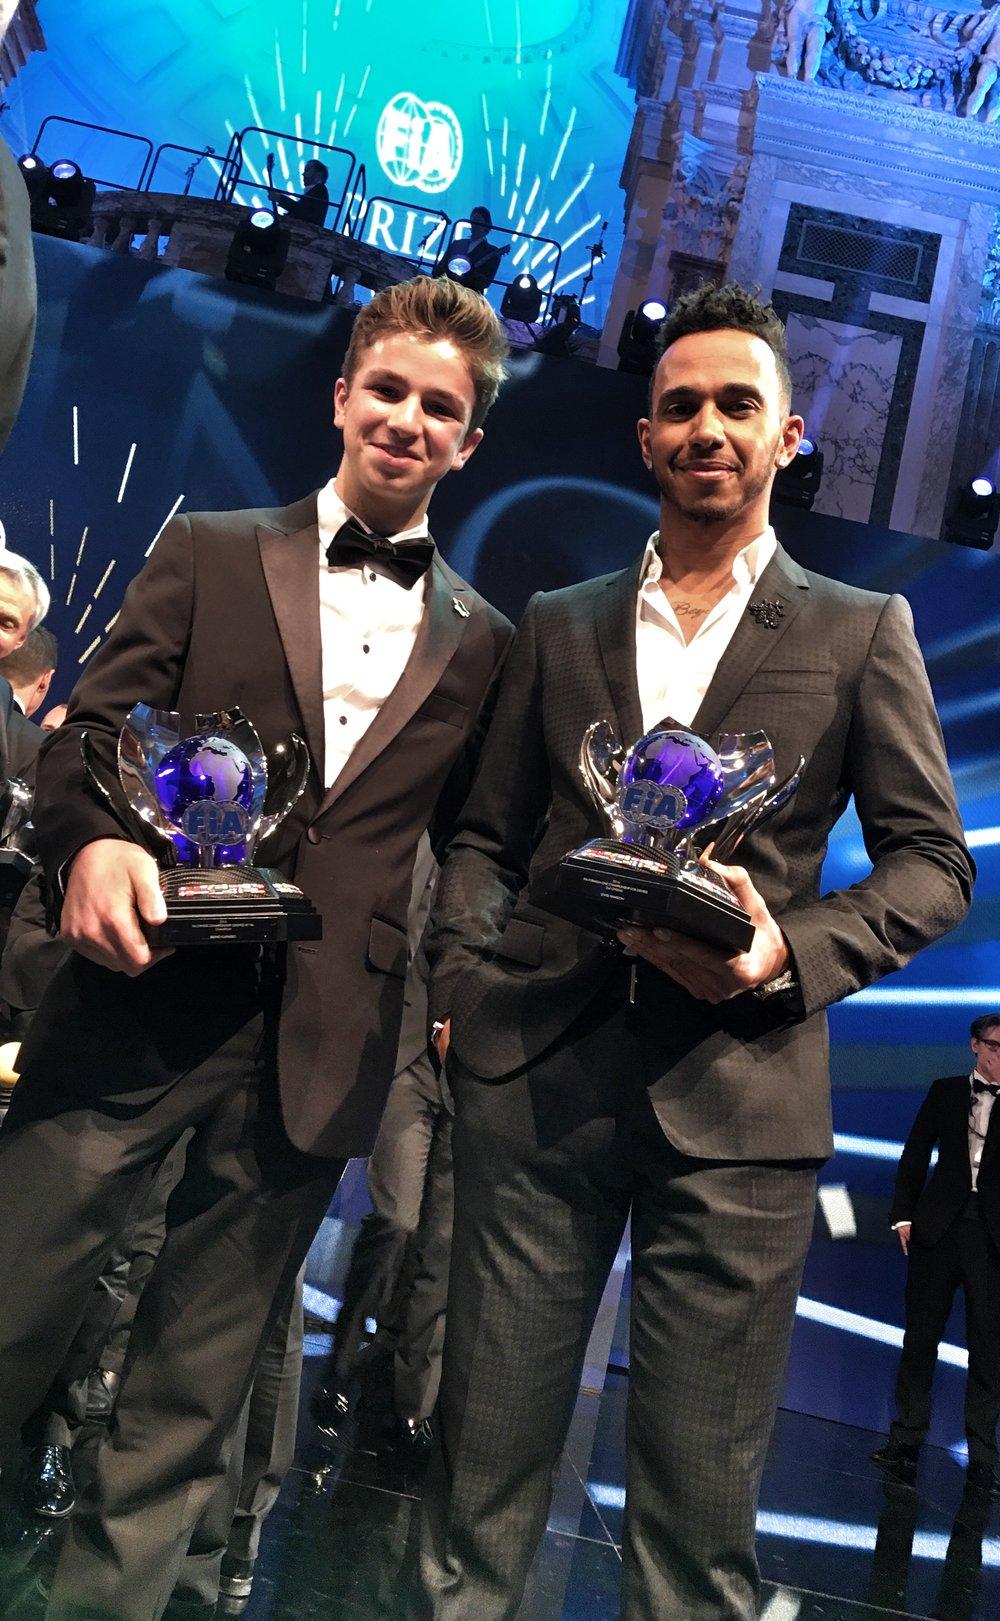 Bruno Carneiro and Lewis Hamilton (3 Times Formula One World Champion)